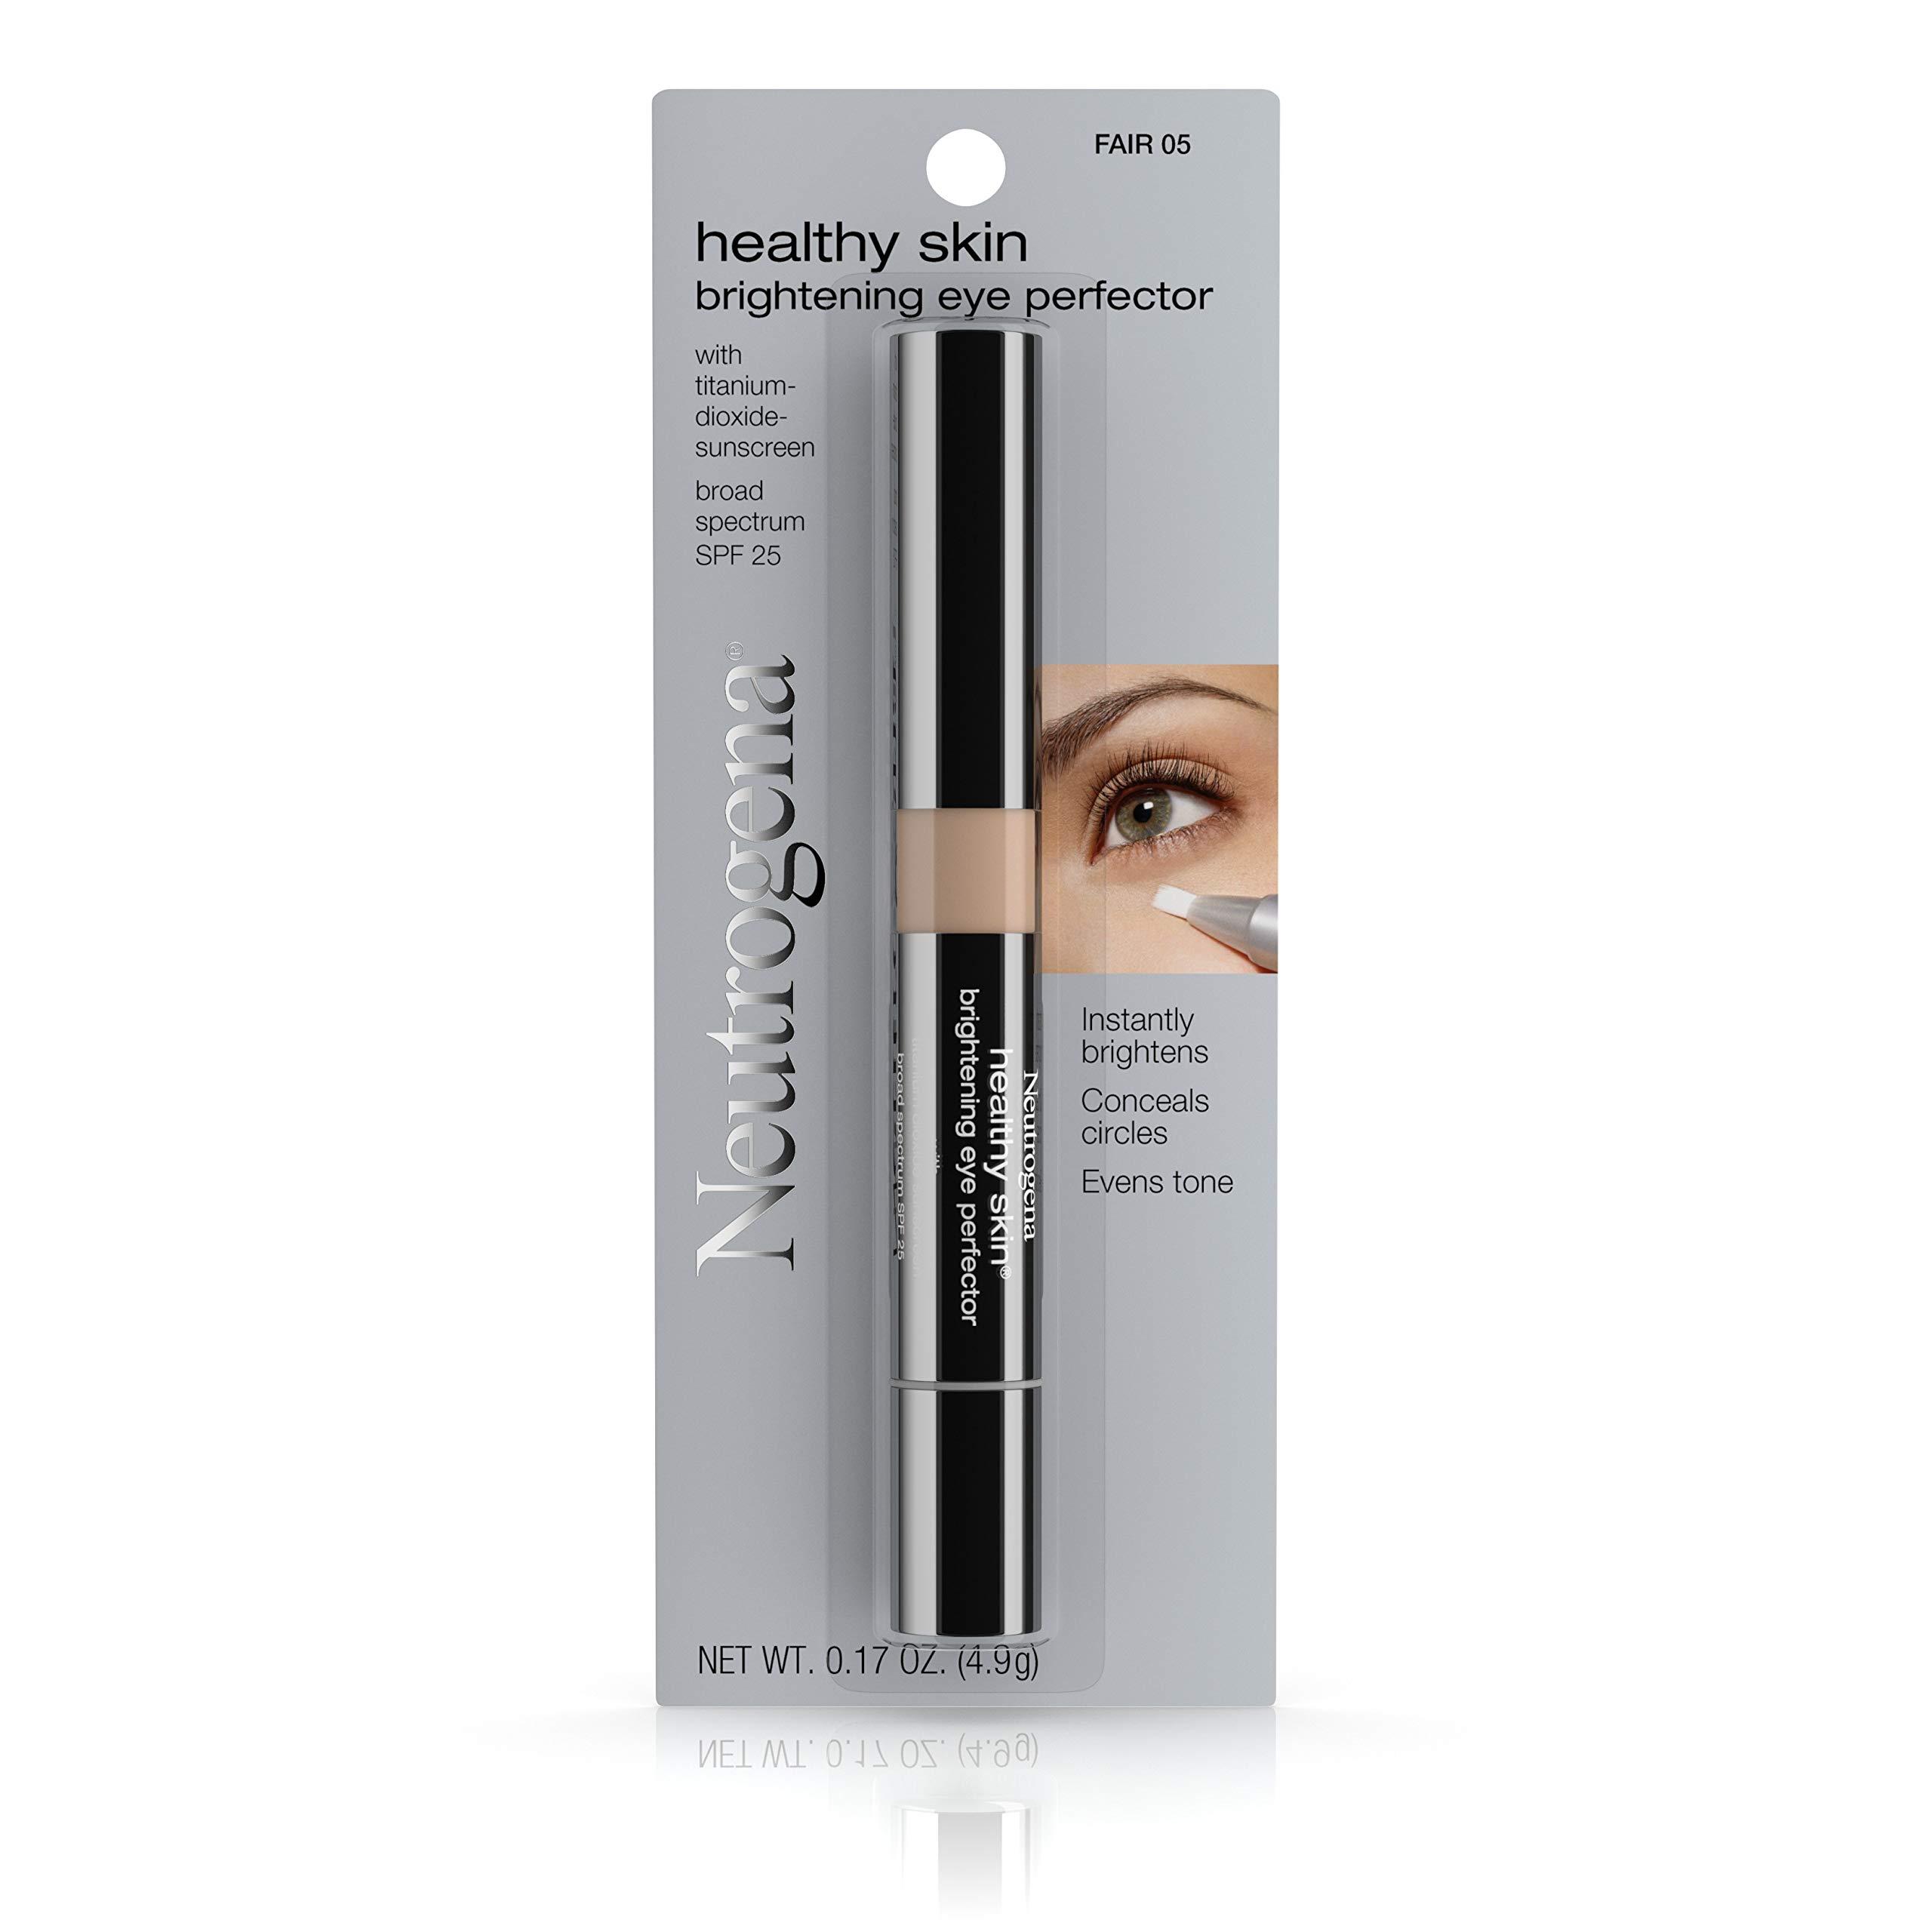 Neutrogena Healthy Skin Brightening Eye Perfector Broad Spectrum Spf 25, Under Eye Concealer, Buff 09, .17 Oz.